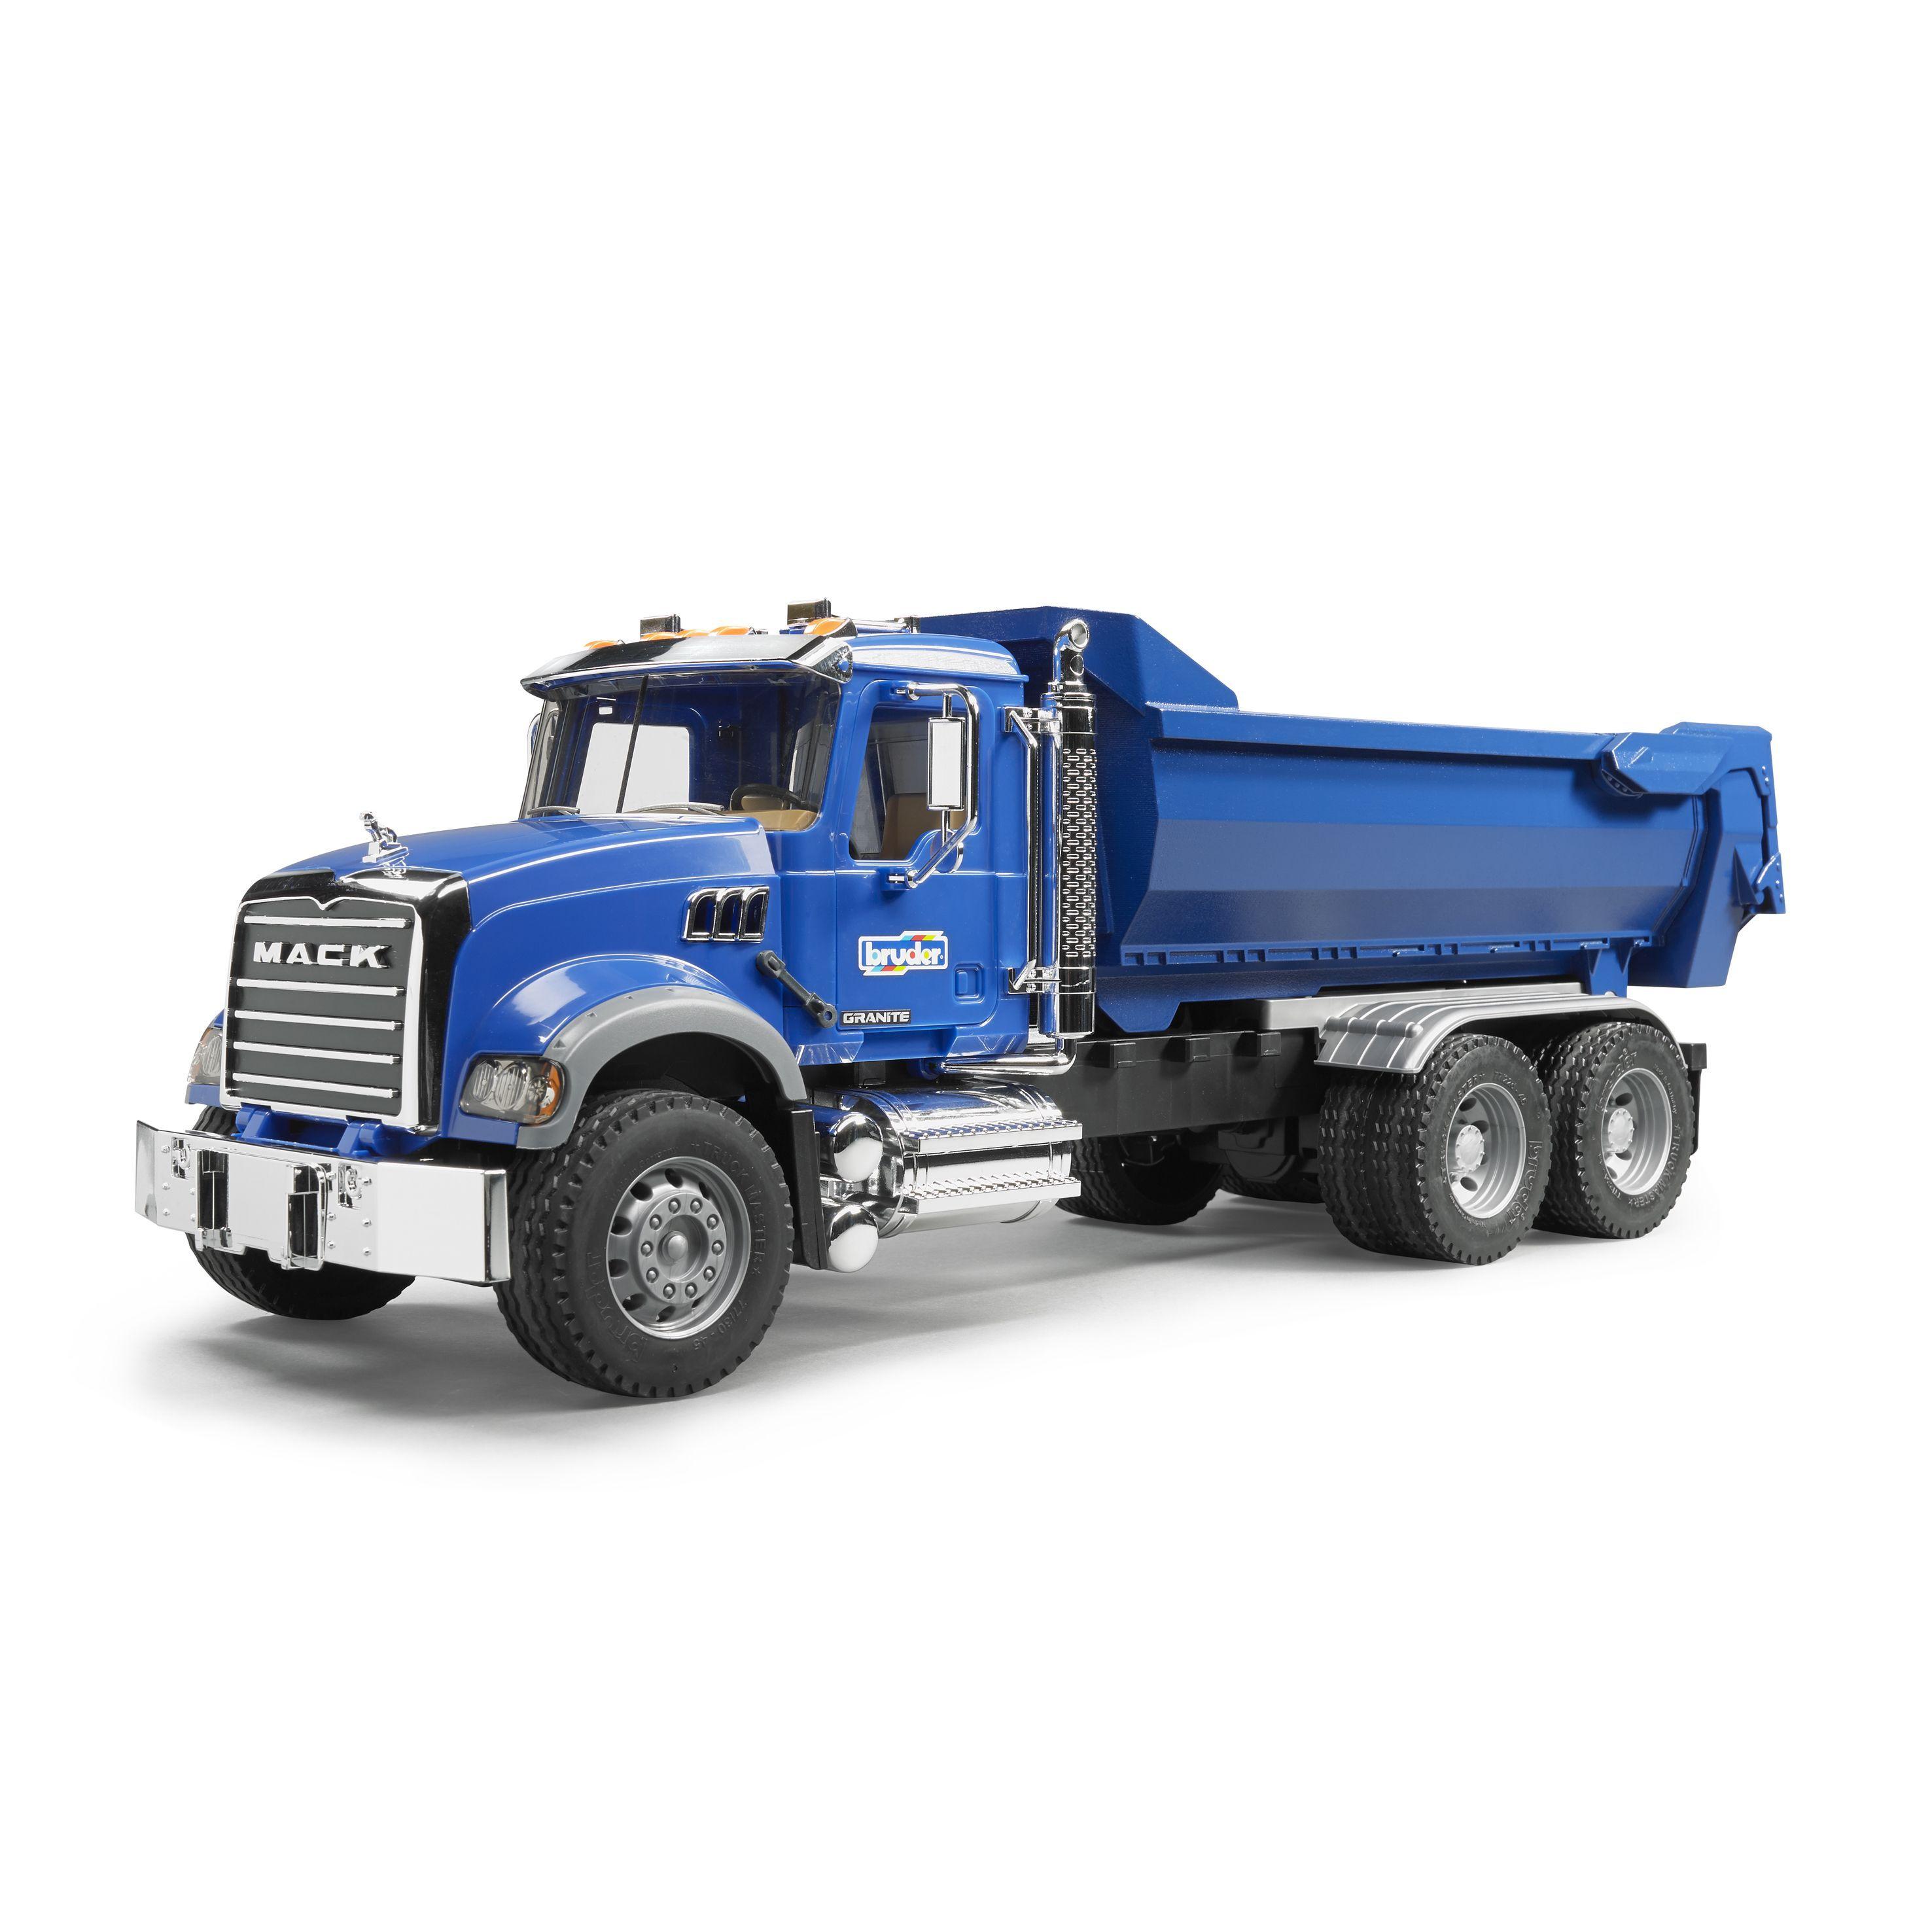 Overstock Com Online Shopping Bedding Furniture Electronics Jewelry Clothing More Dump Truck Trucks Mack